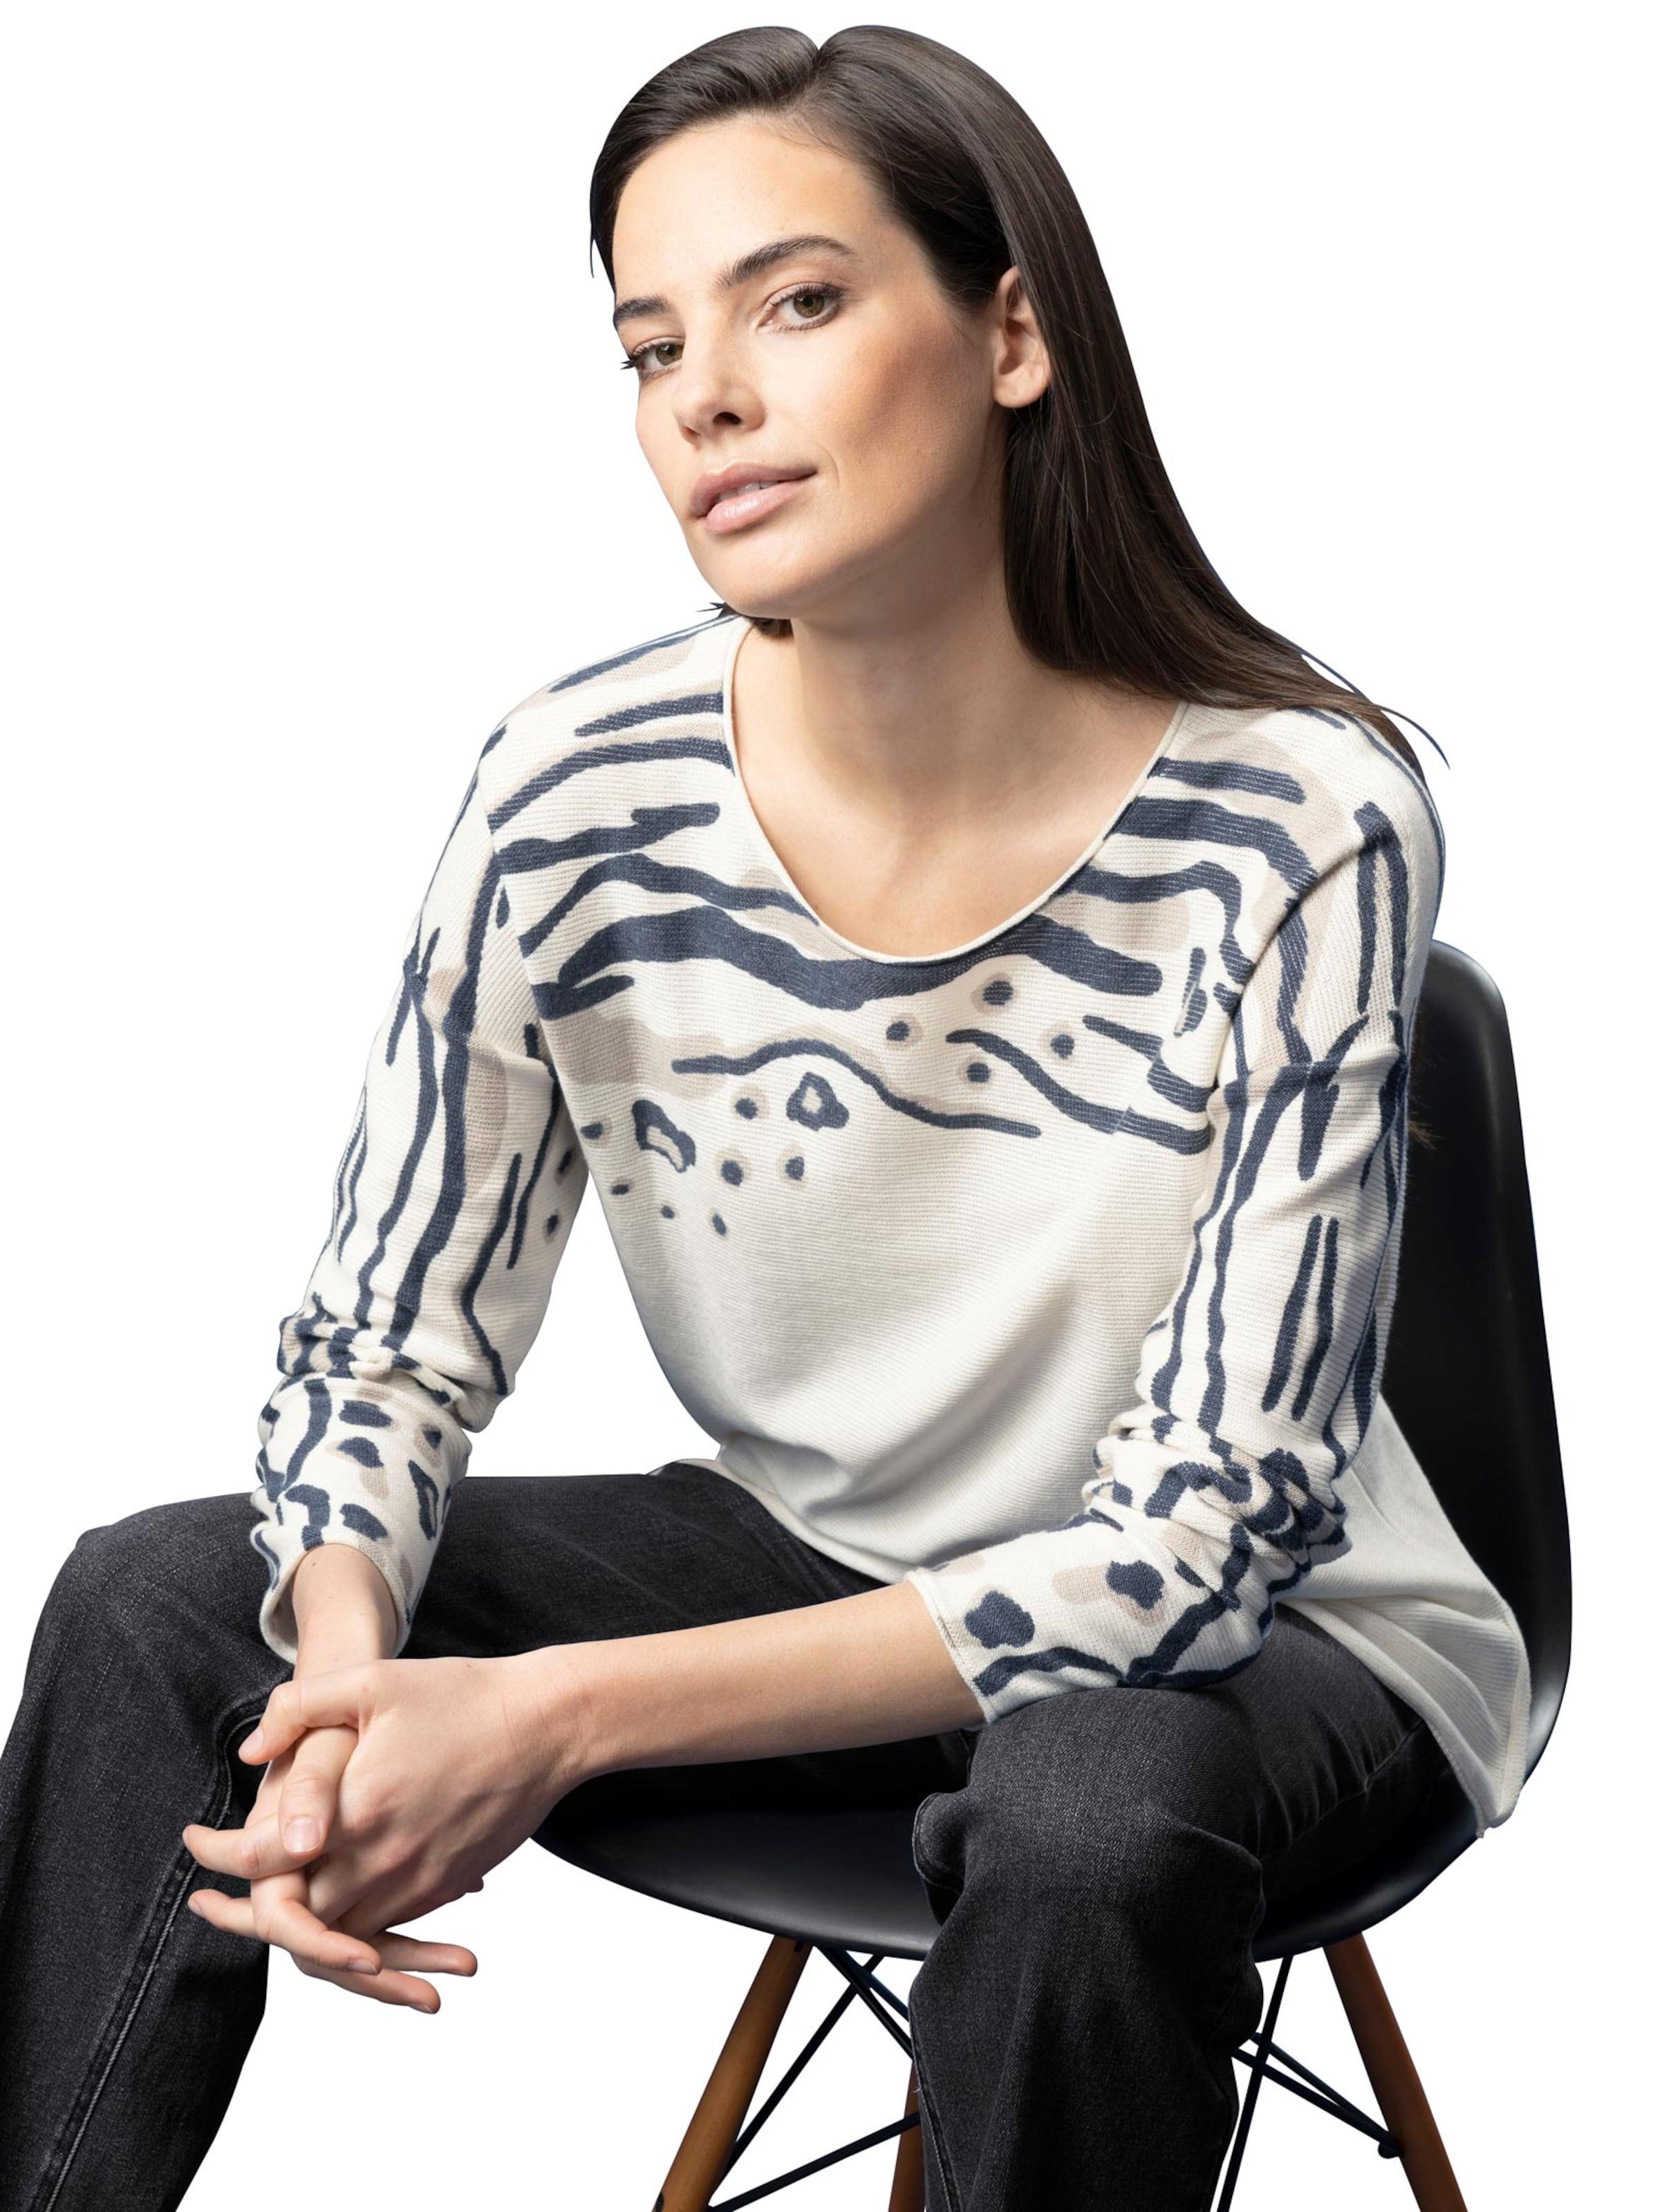 witt weiden - Damen Druck-Pullover bunt